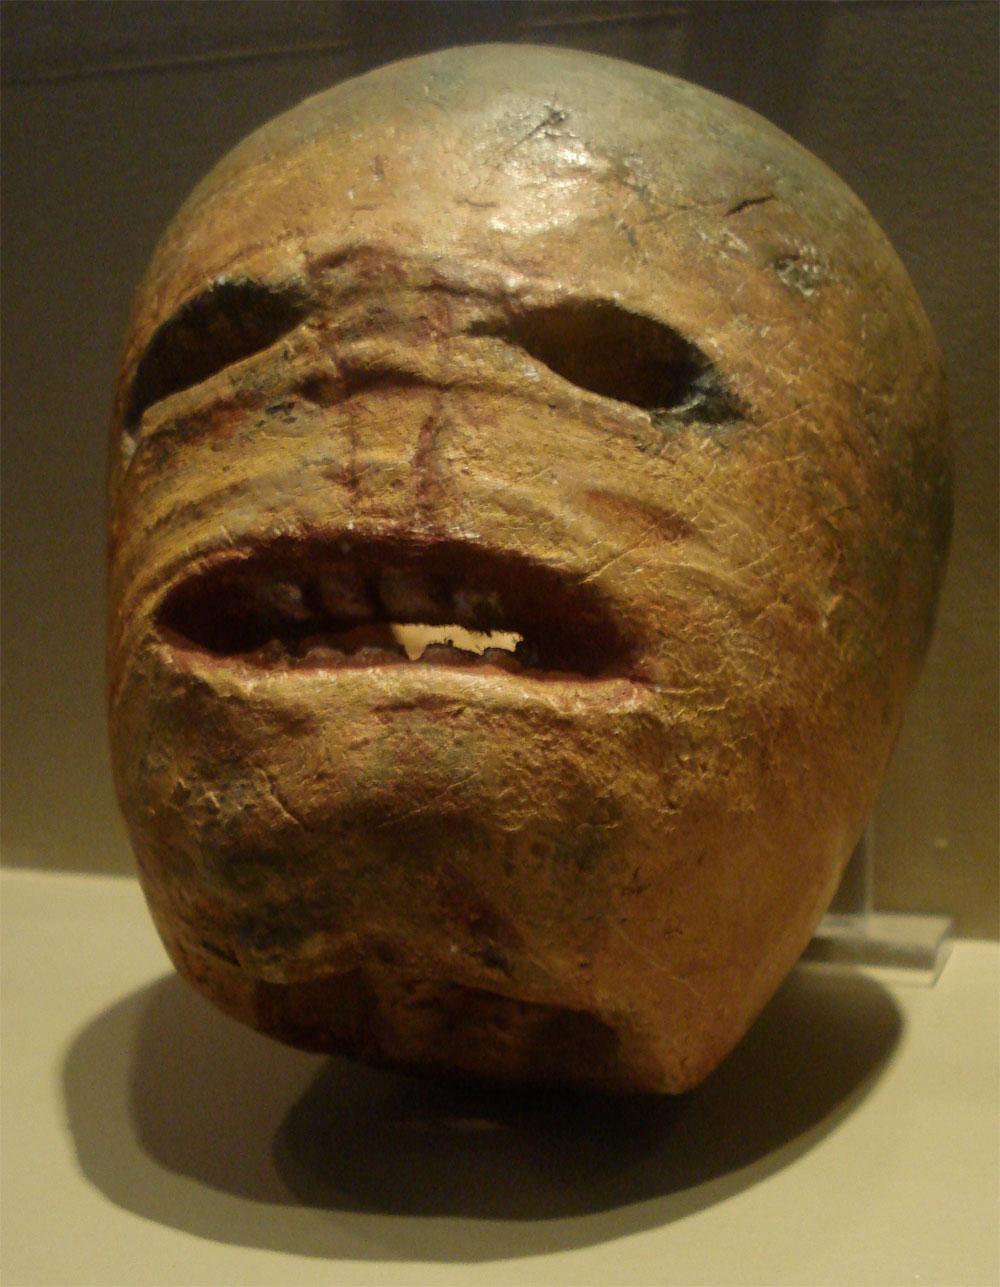 Uncategorized Origin Of Jack O Lantern traditional irish rutabega lantern from the early 1900s 1900s